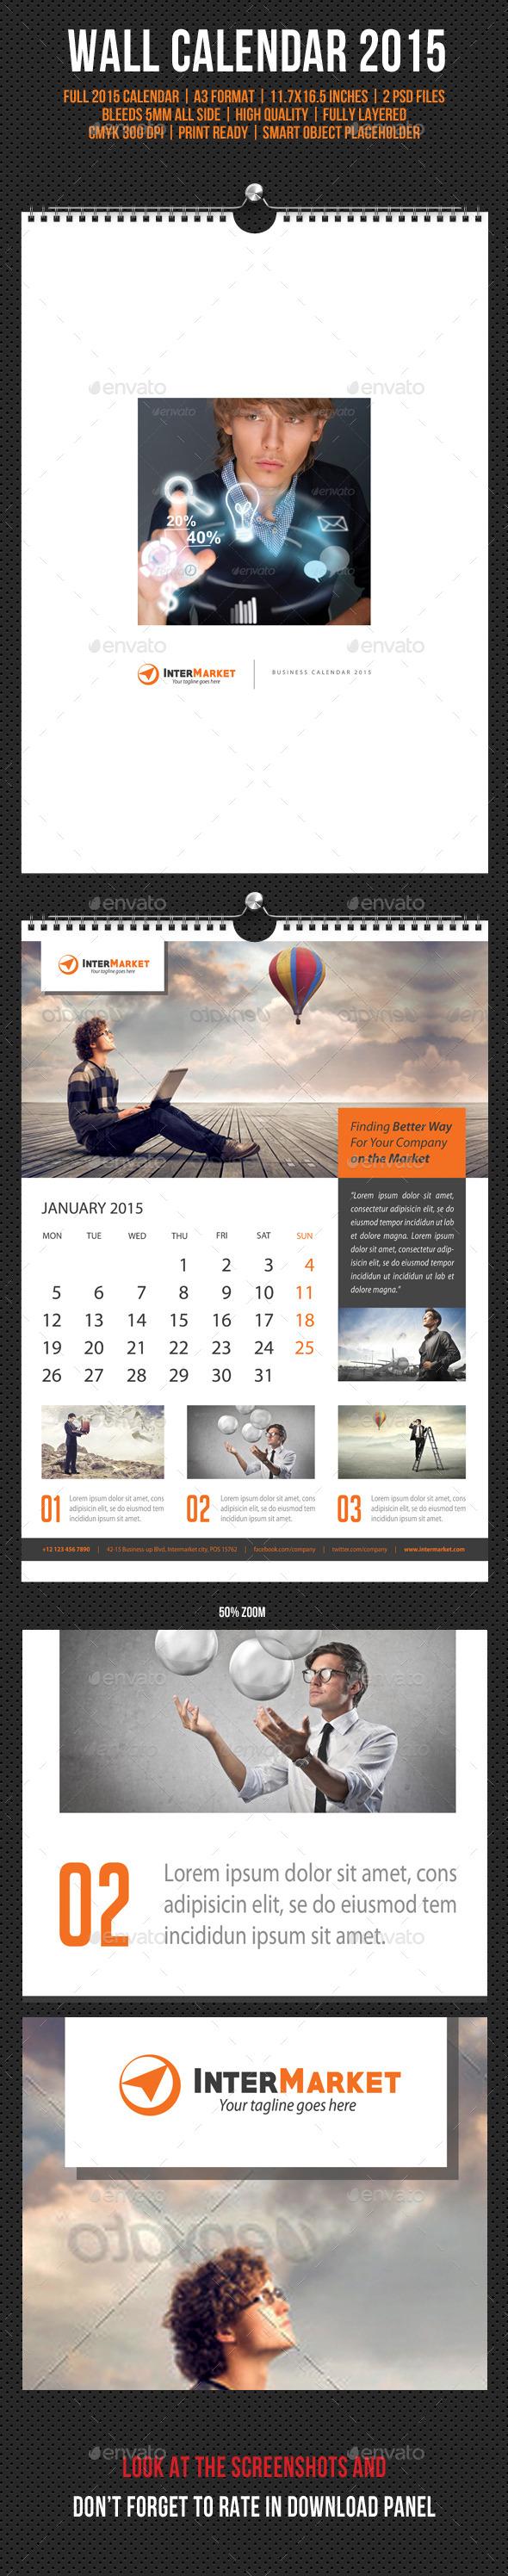 Corporate Wall Calendar 2015 V05